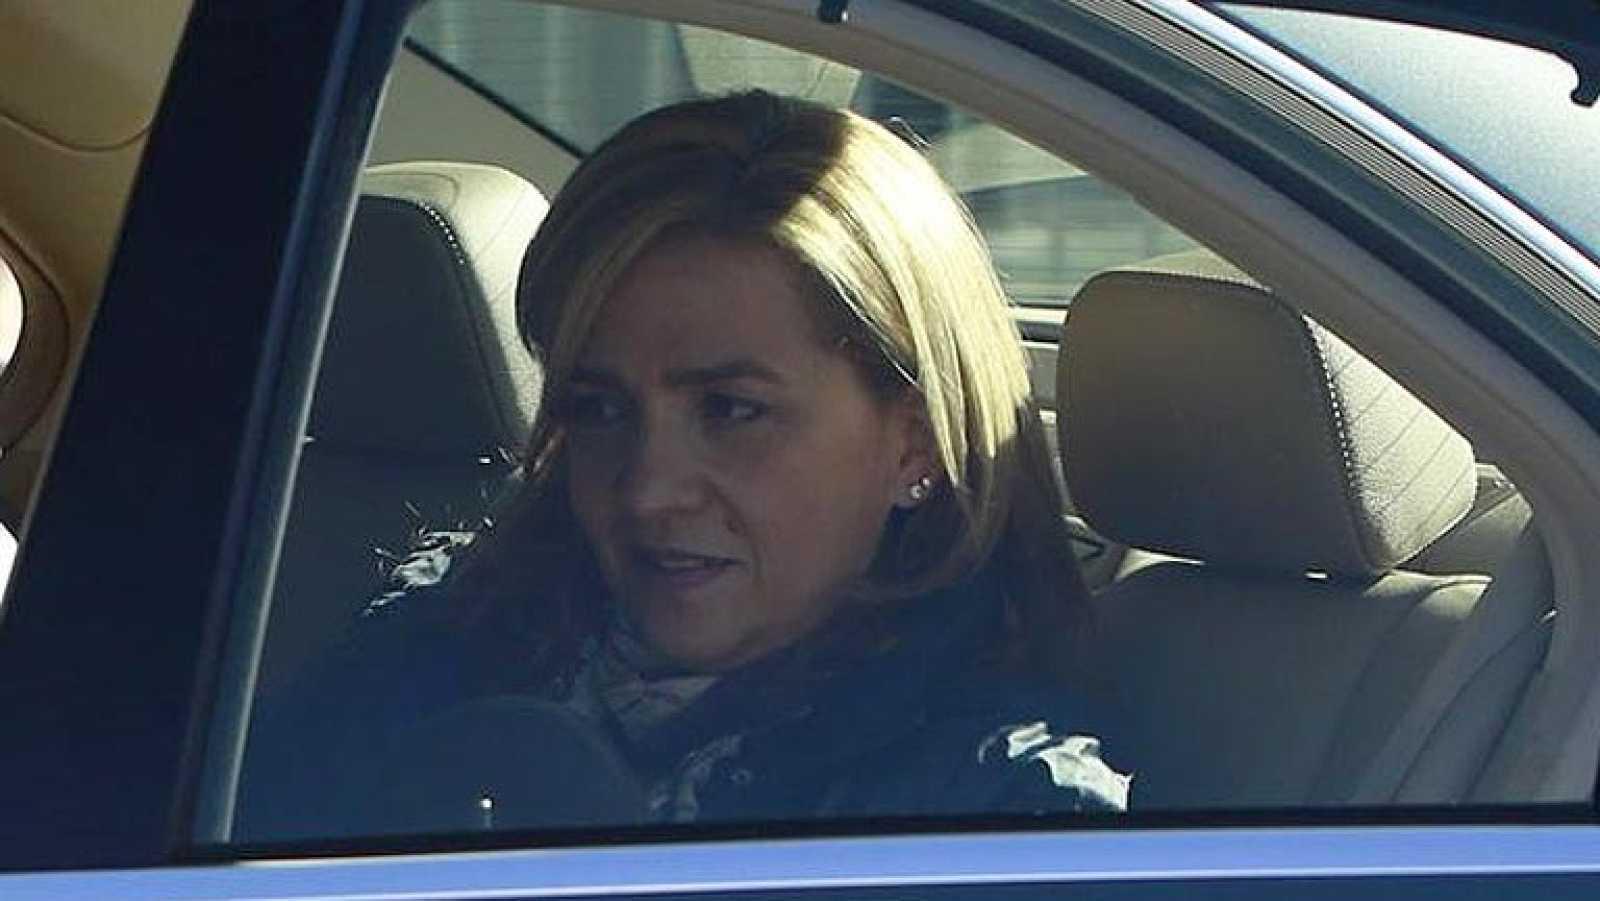 La infanta Cristina podrá llegar en coche a la puerta del juzgado